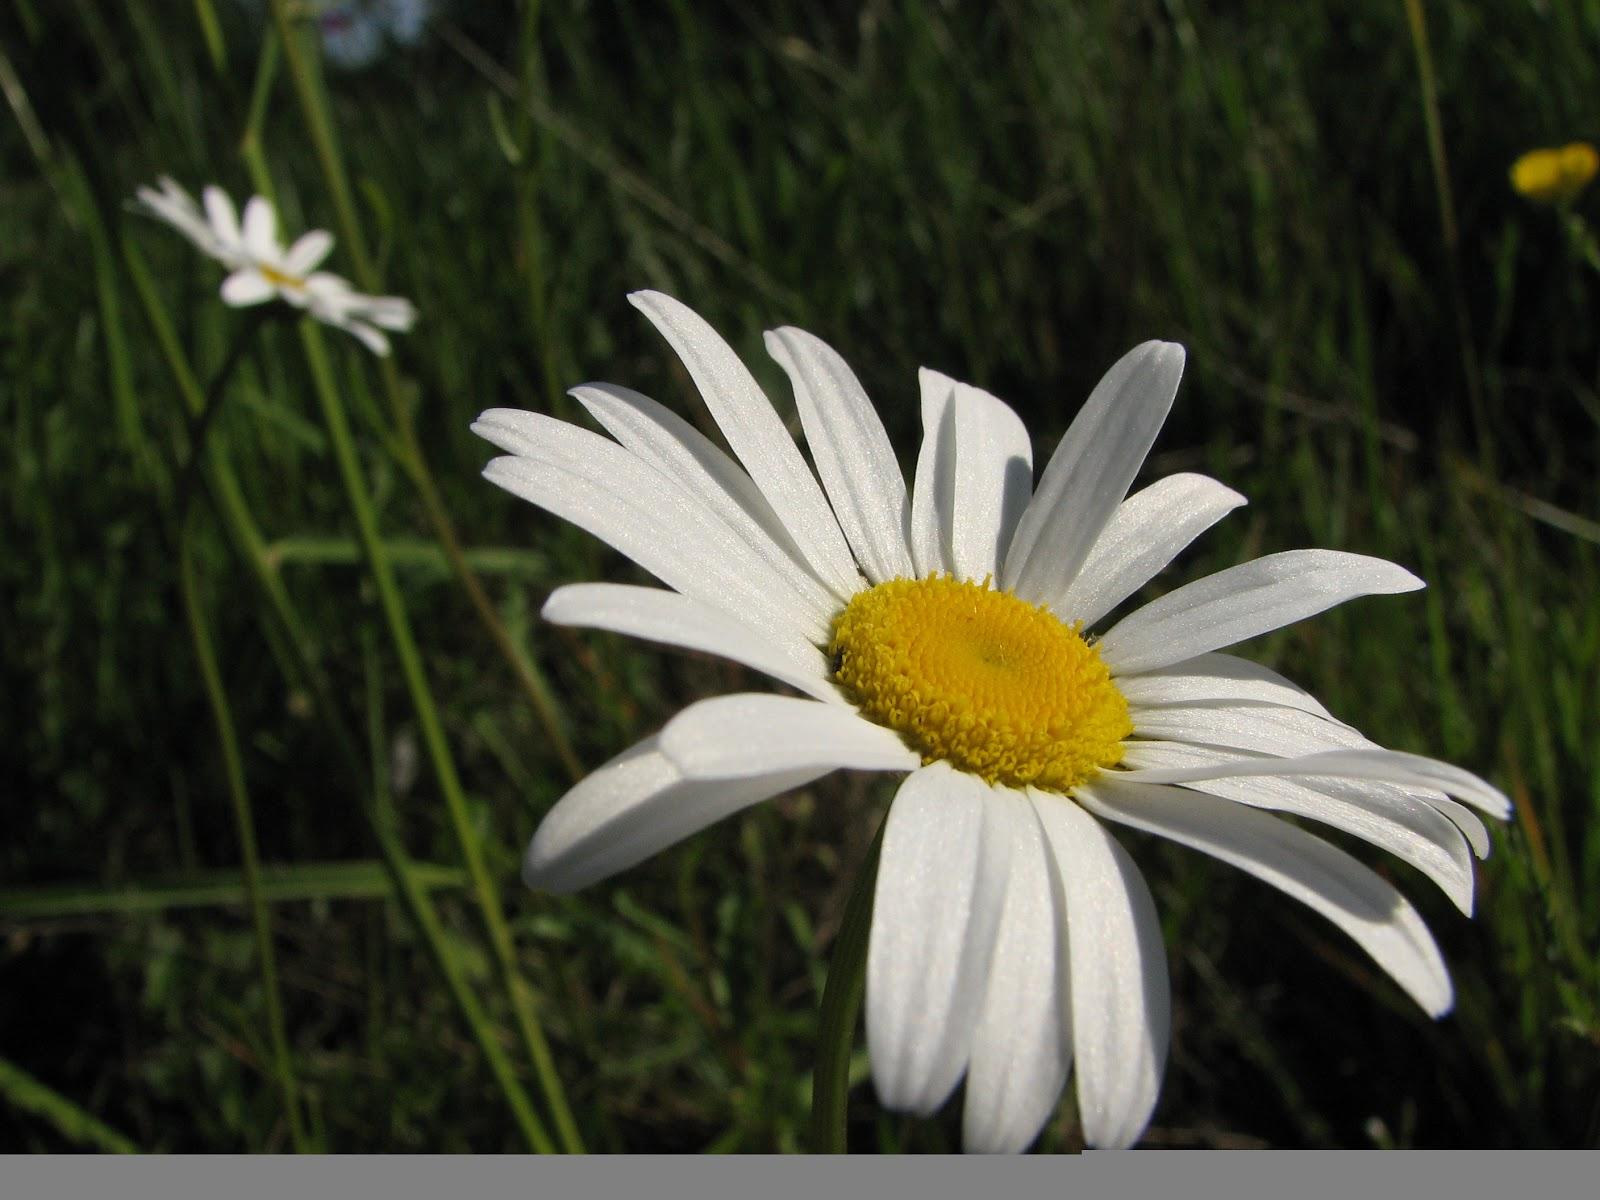 Daisy flower blog art designs blog art designs izmirmasajfo